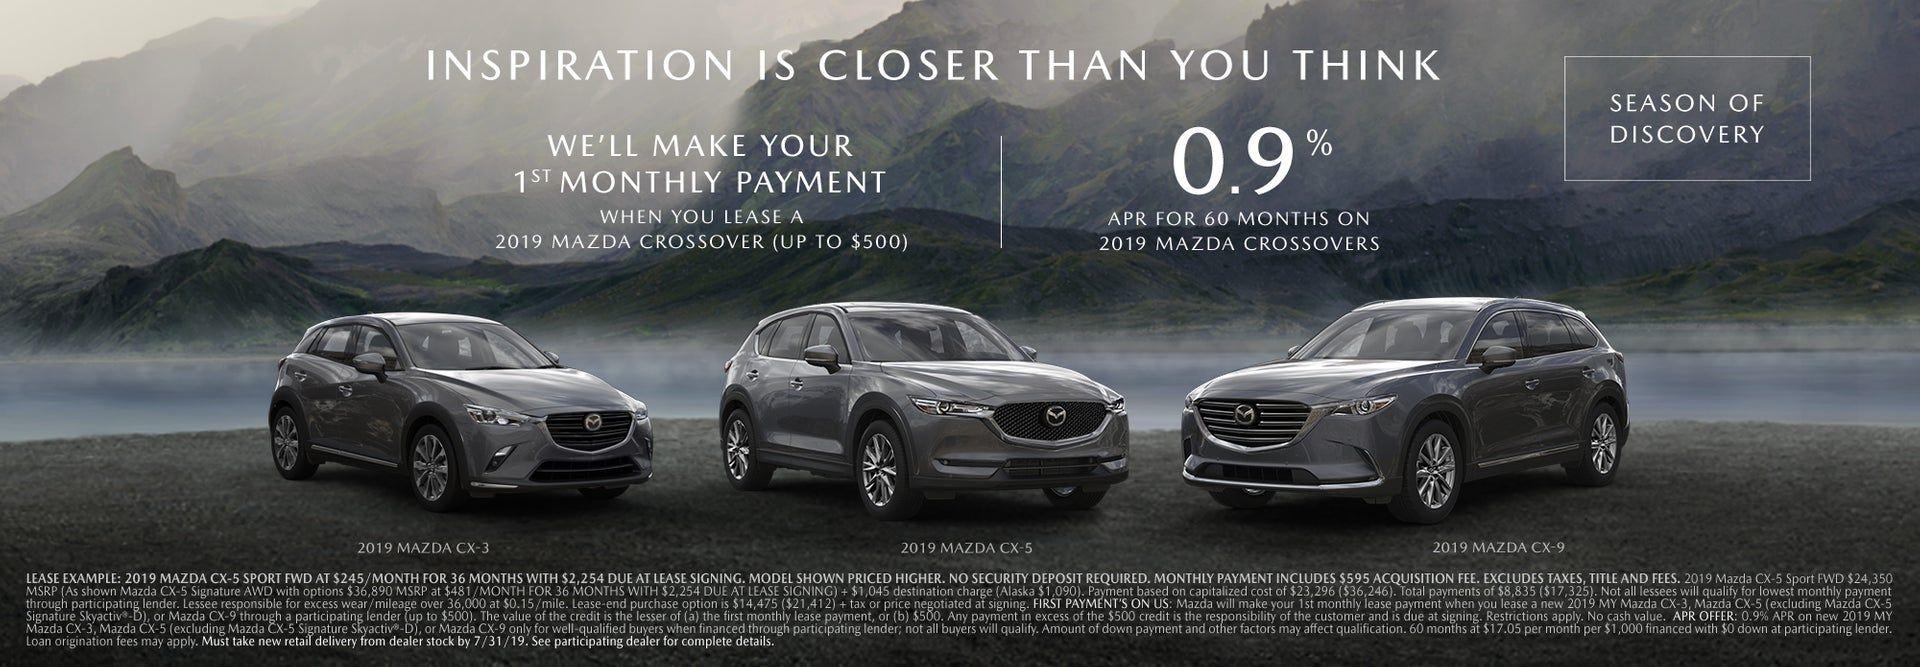 Summer Event Mazda Graduate Program Incentive Programs